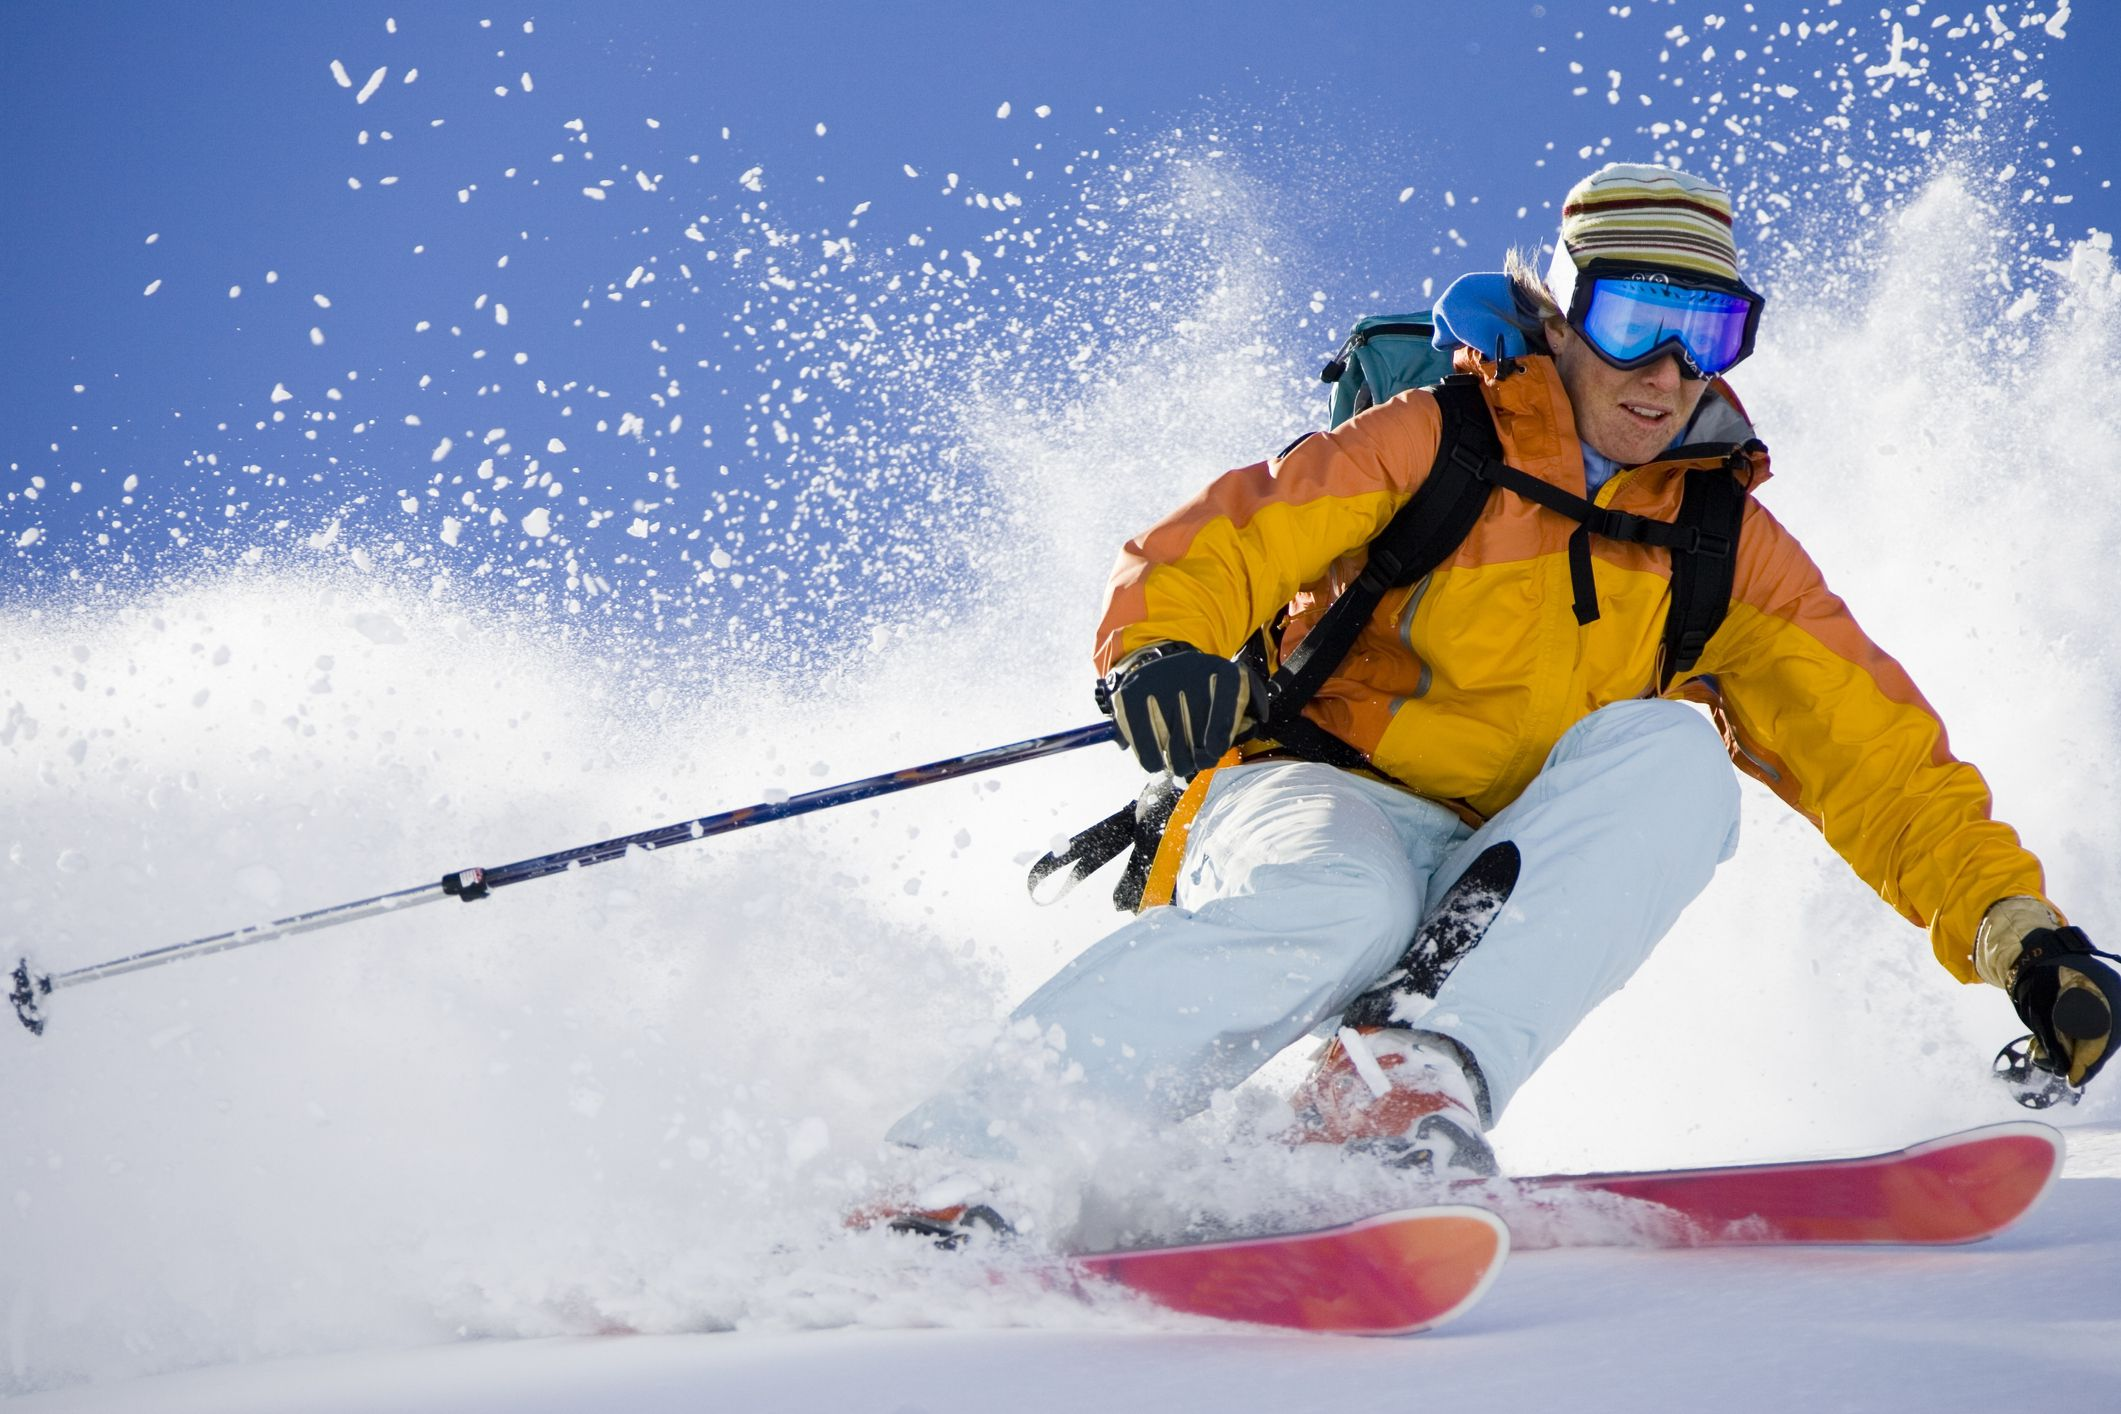 The 8 Best Powder Skis